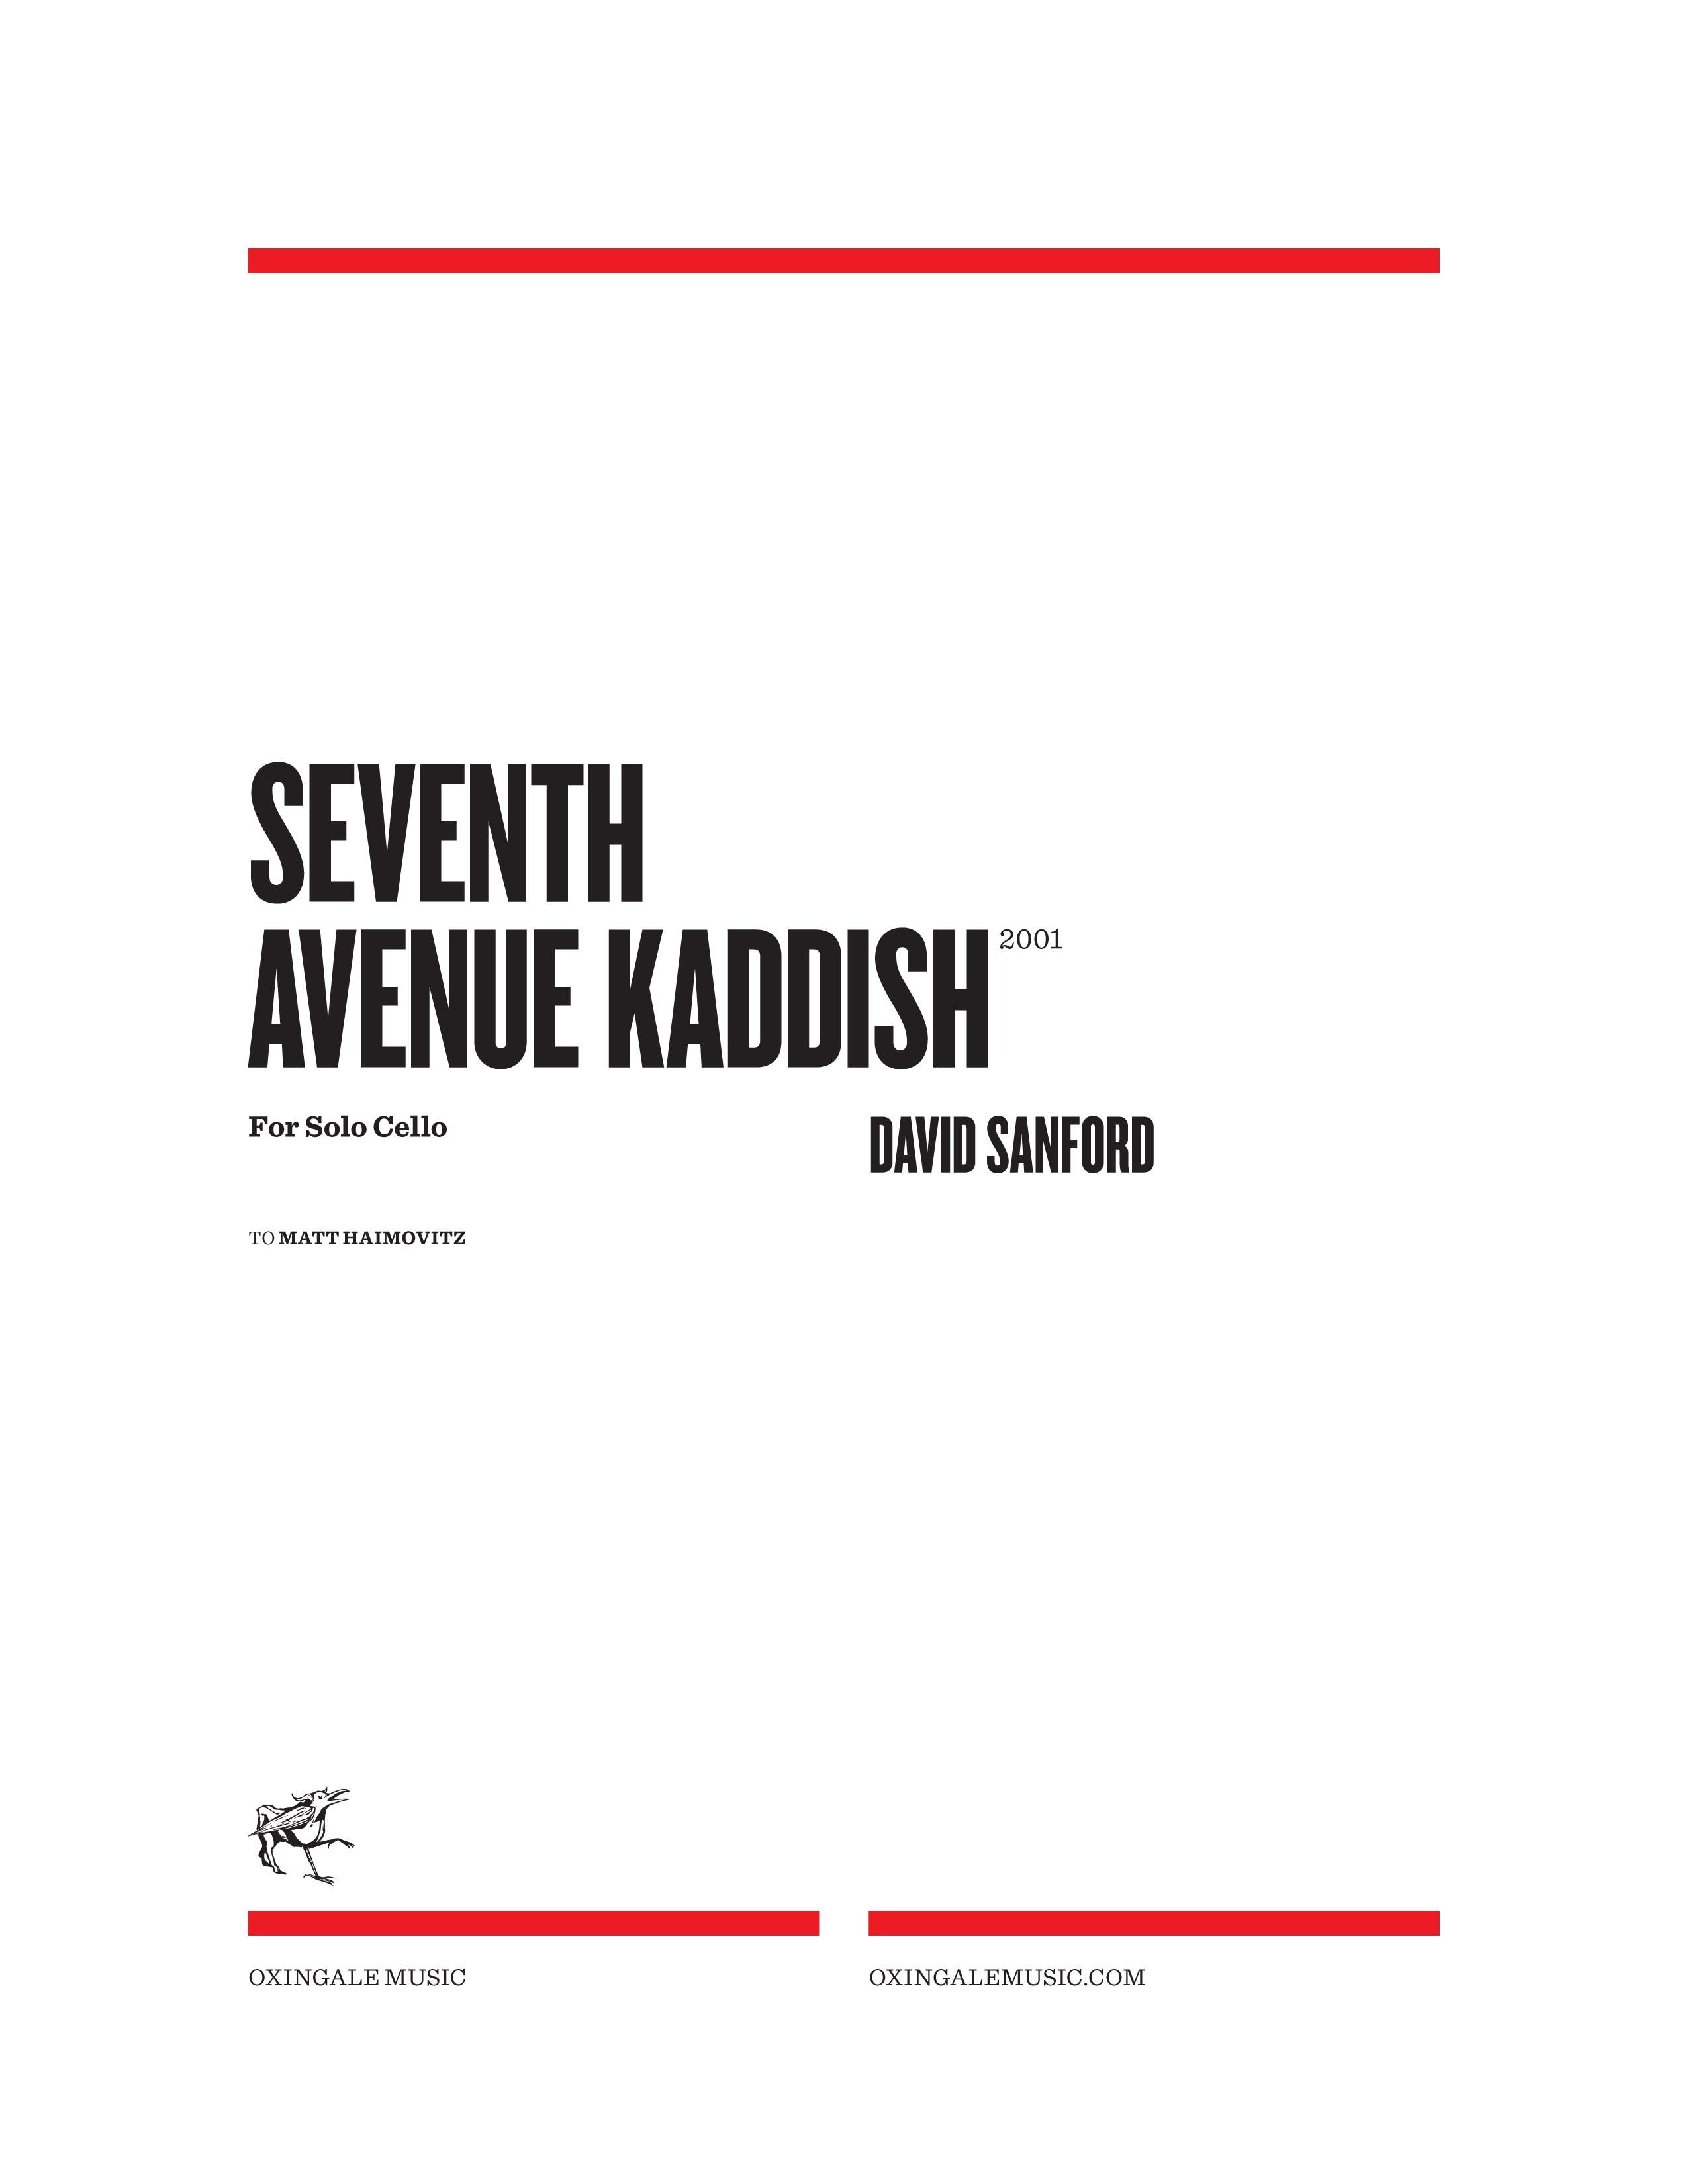 Seventh Avenue Kaddish Oxingale Music